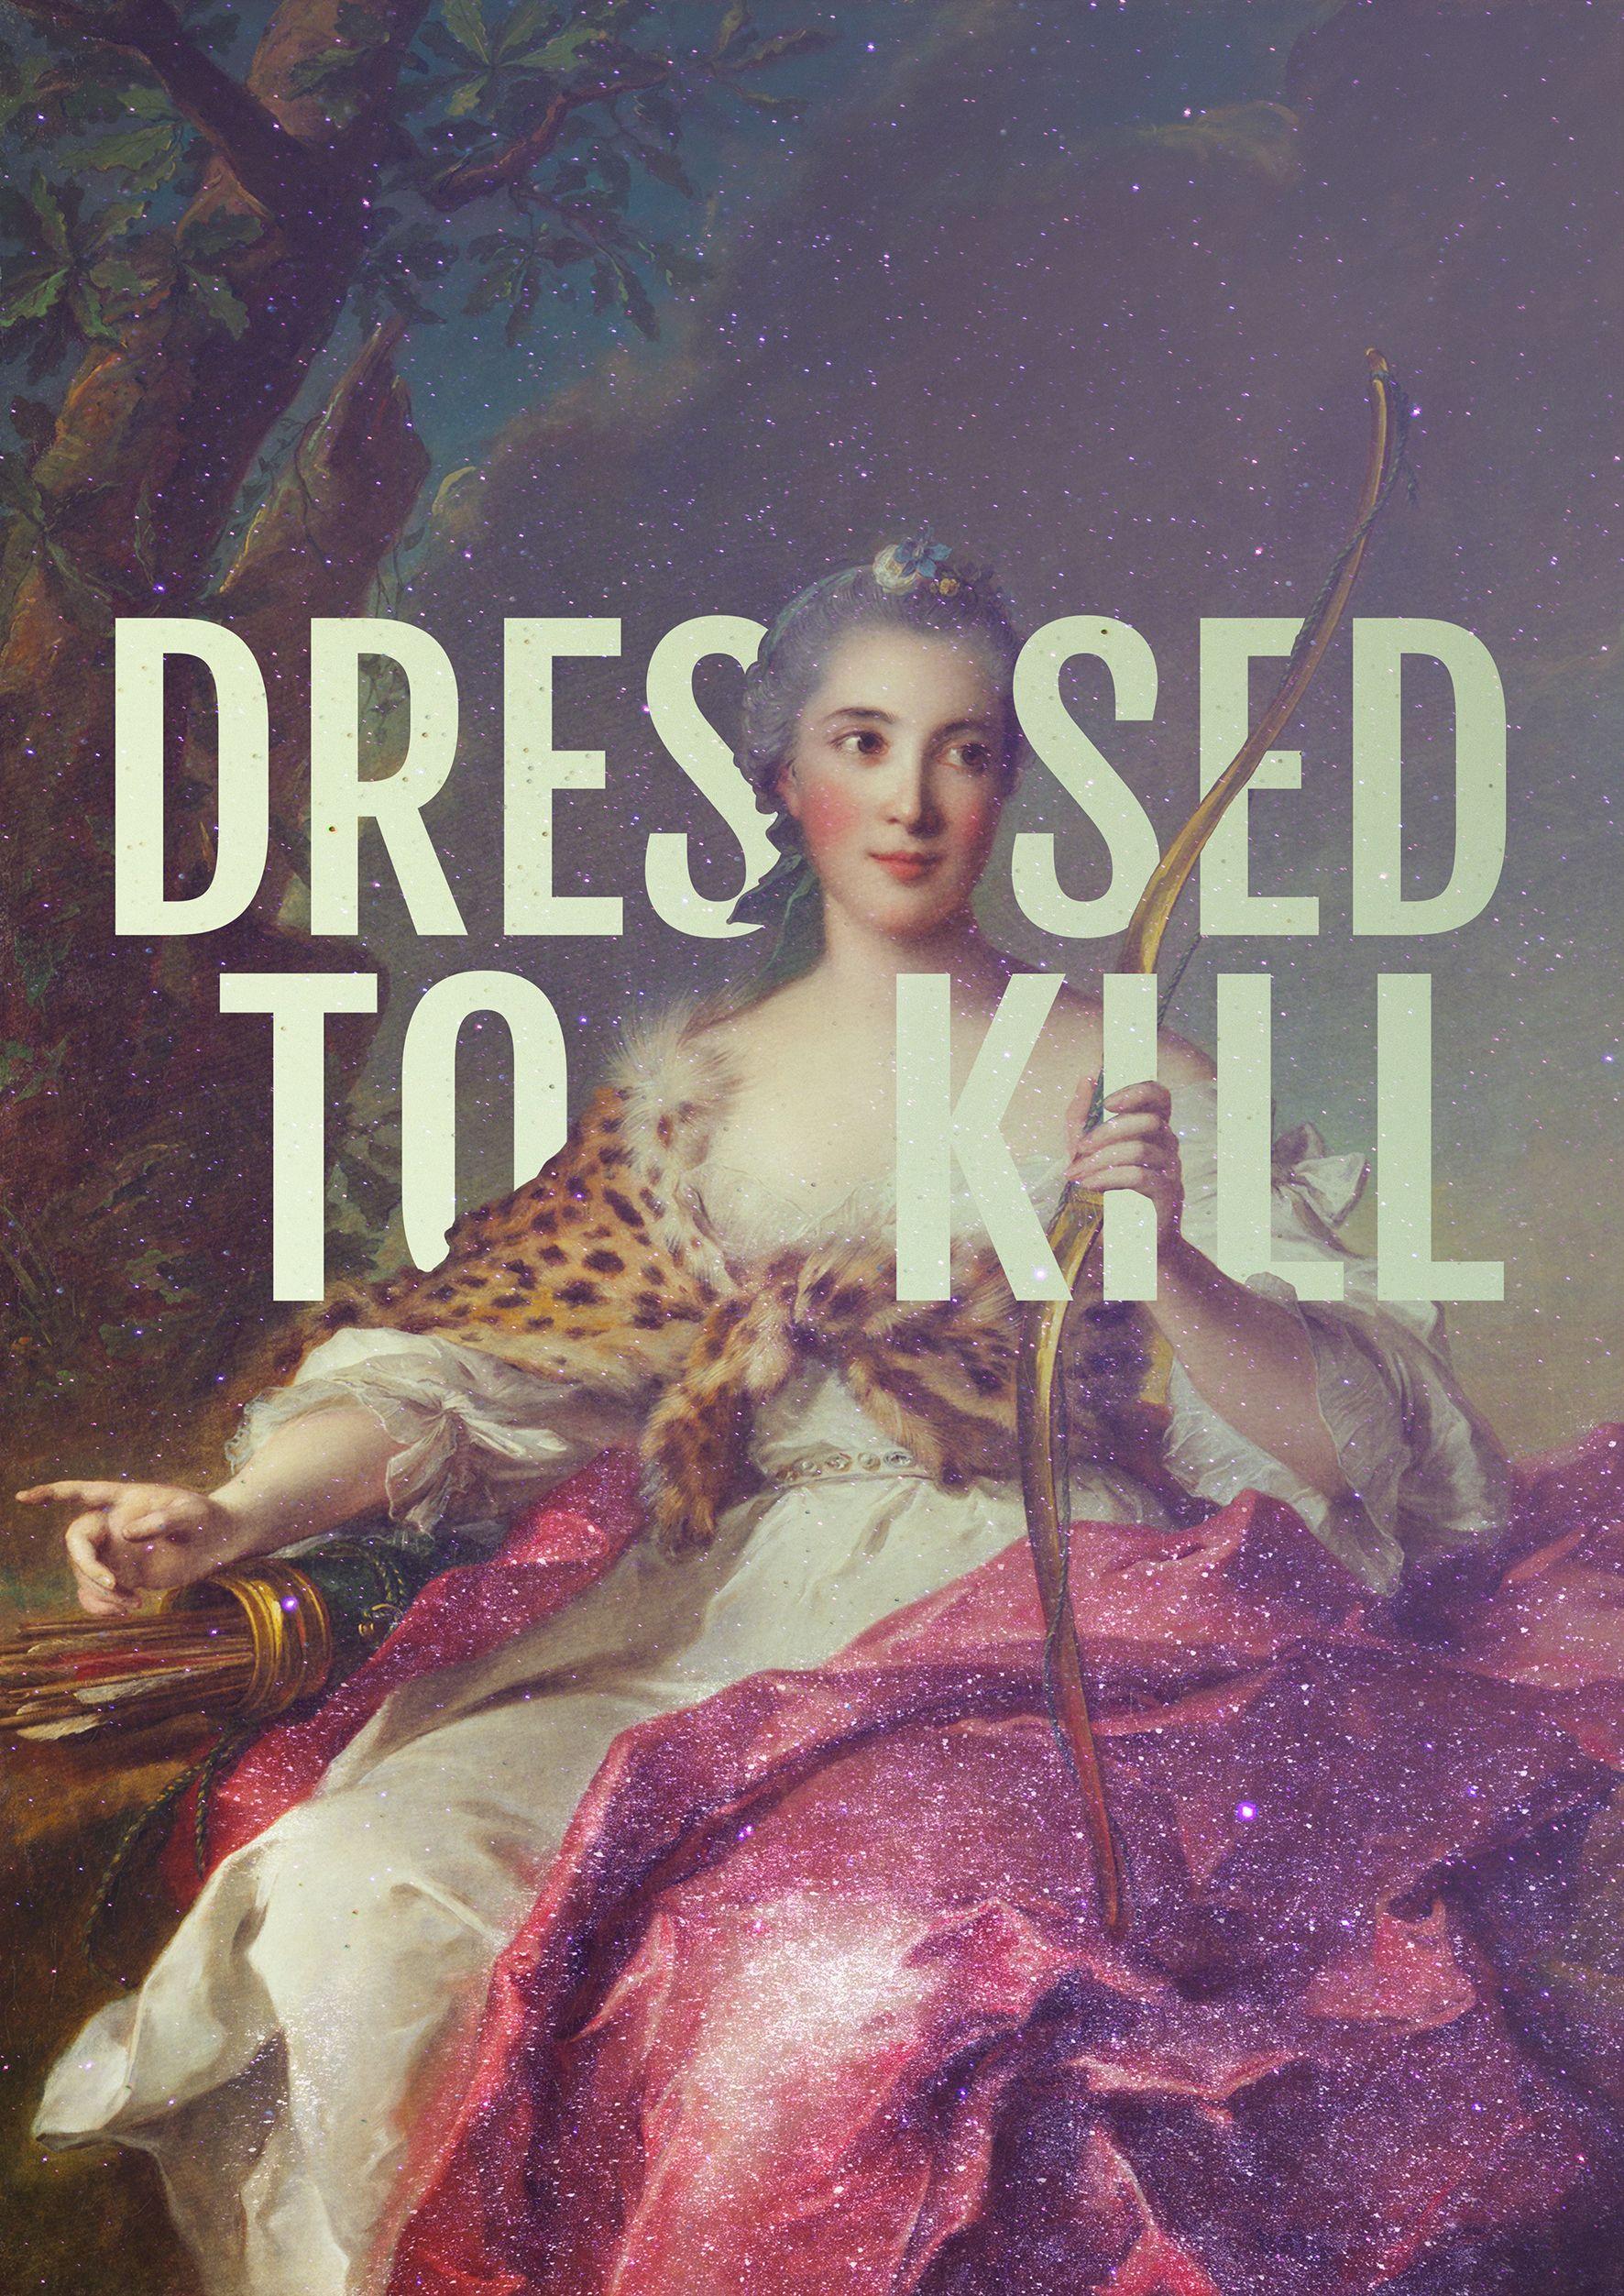 Dressed To Kill Classical Art Fine Art Design Classical Art Memes Art Parody Classical Art